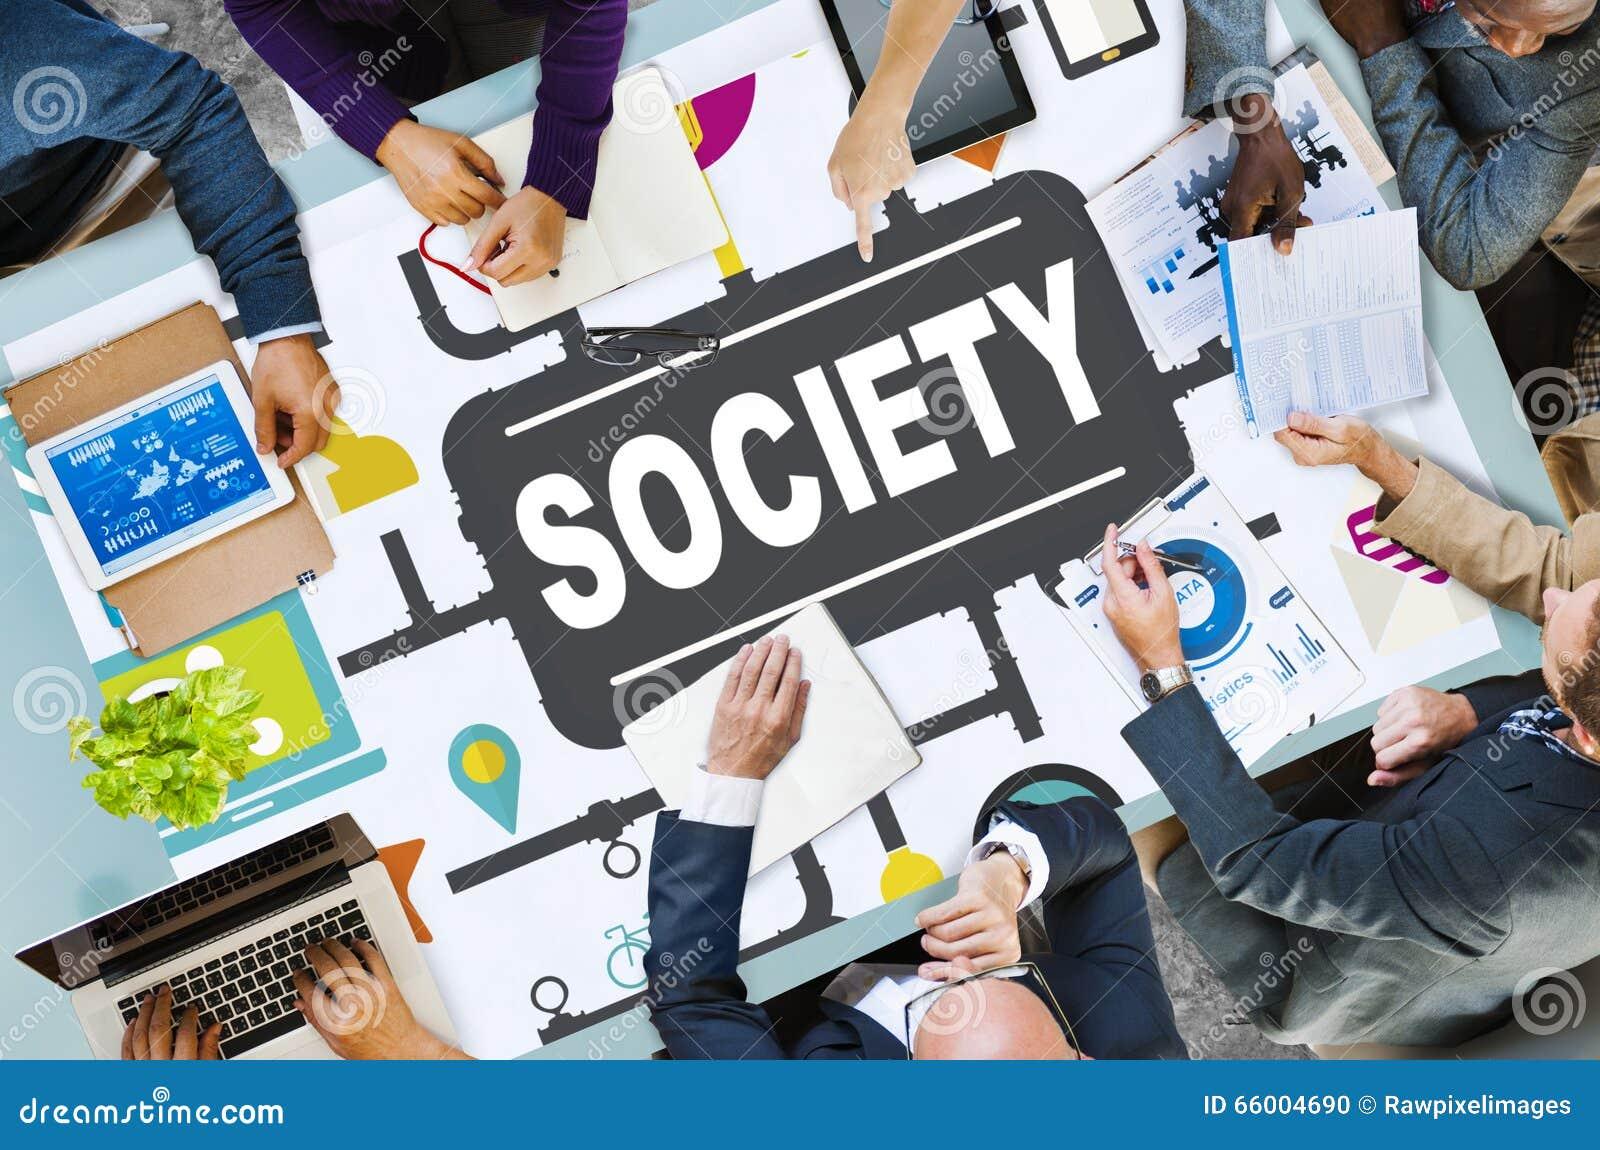 cyberspace in a community Maka cyber community adalah sekumpulan manusia yang saling berkomunikasi, bertukar informasi, menjalankan hidup melalui media elektronik, dikarenakan semakin membudayanya aktifitas manusia menggunakan elektronik seperti halnya masyarakat nyata, masyarakat maya.